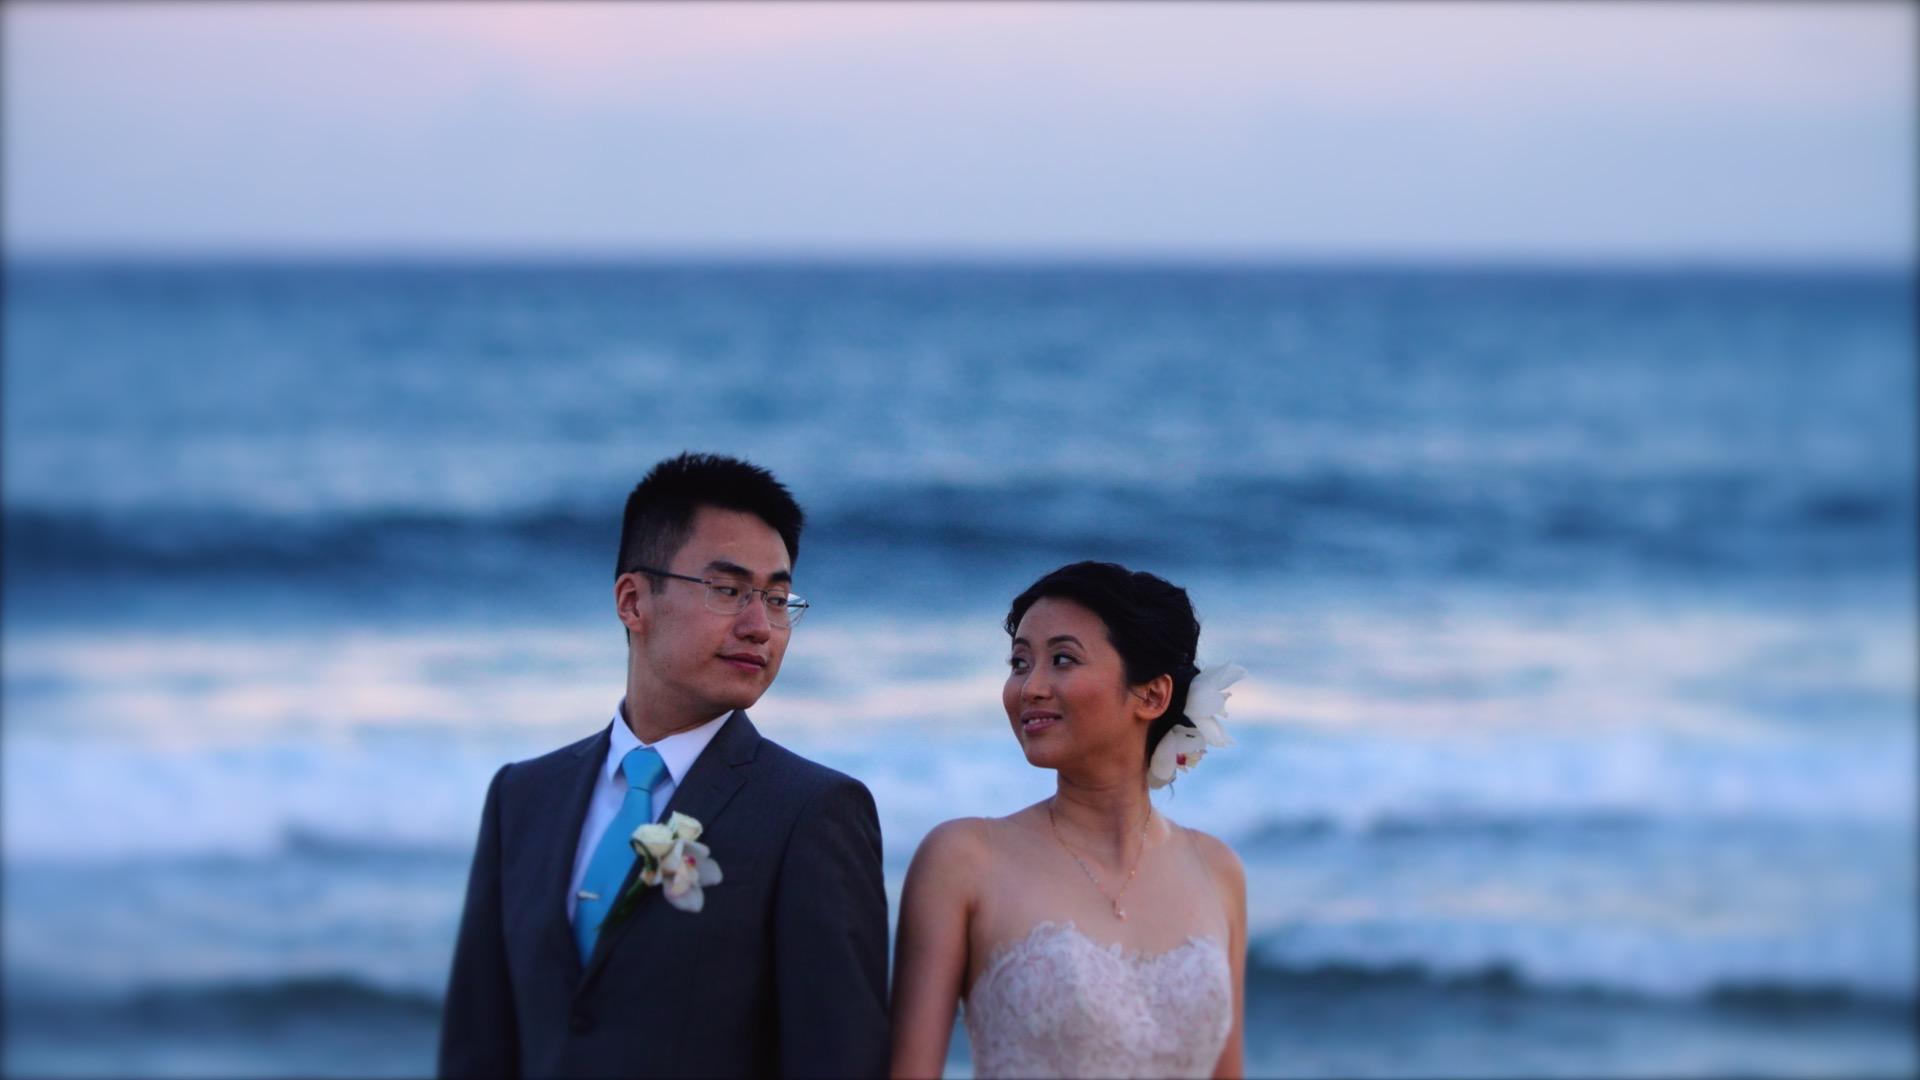 Jenny + Marcus | Kauai County, Hawaii | Park Hyatt Kauai